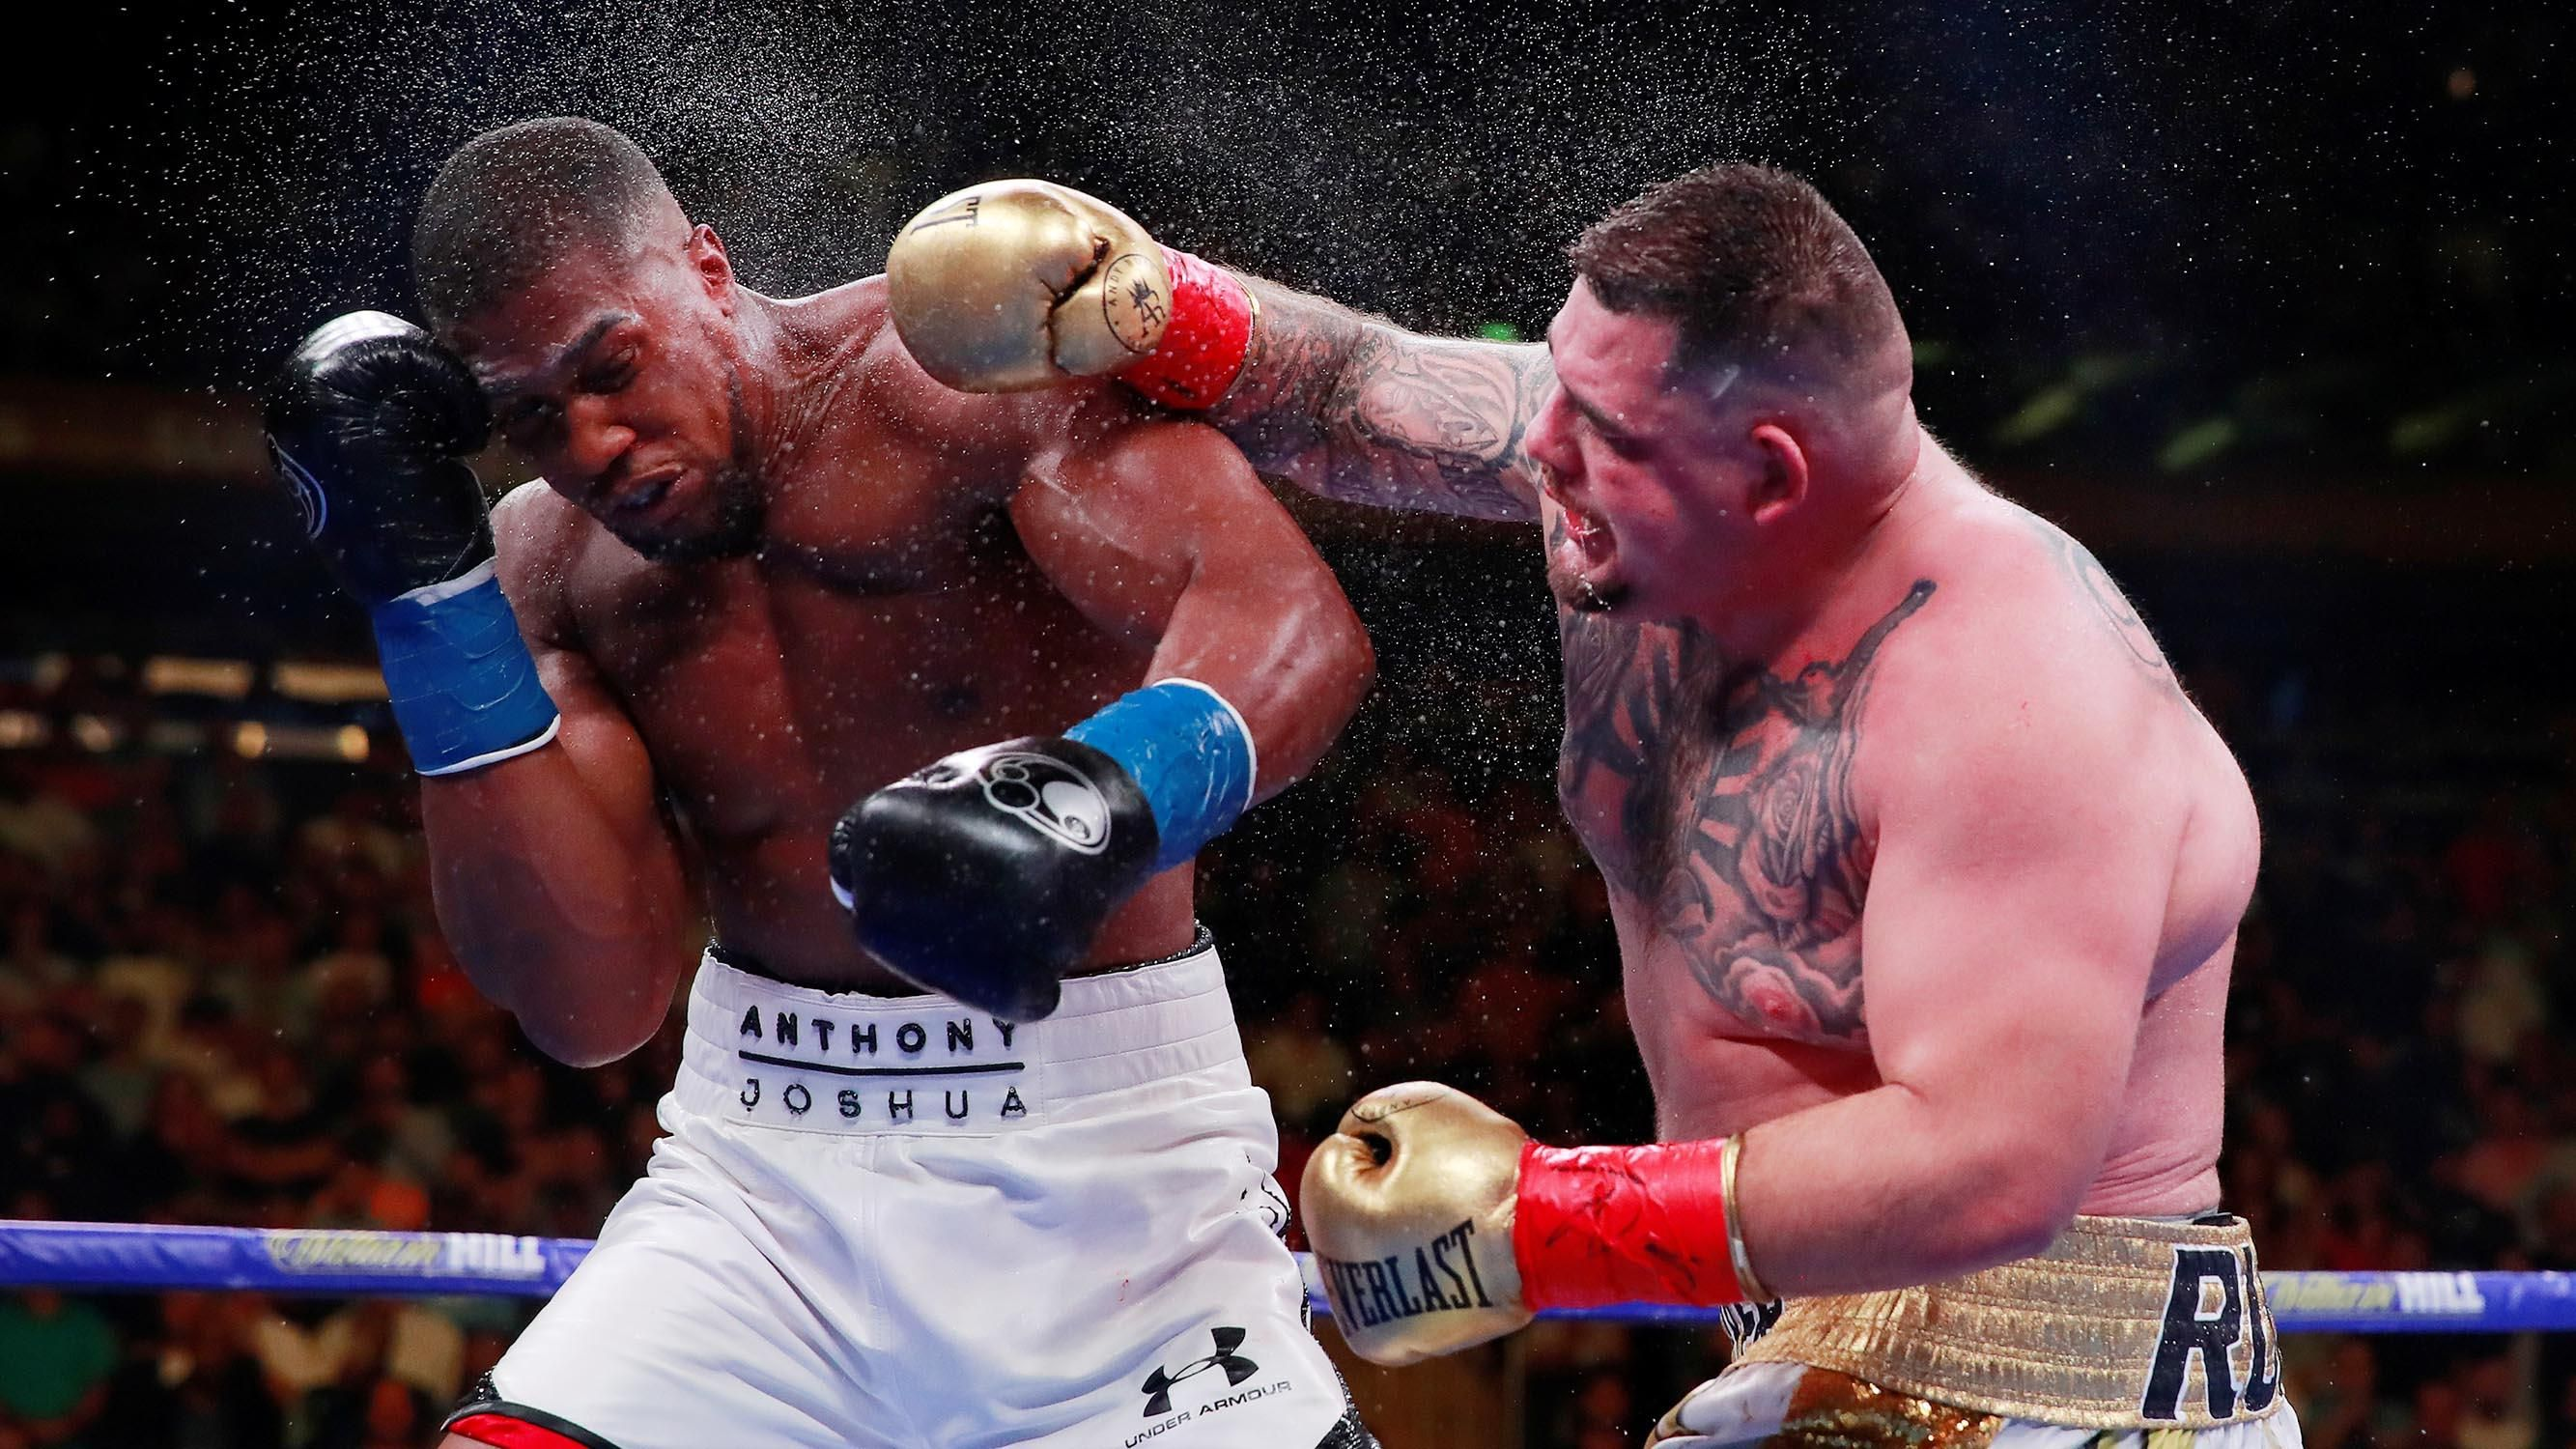 Boxing News Anthony Joshua Vs Andy Ruiz Jr Rematch Date And Venue Confirmed Anthony Joshua Anthony Joshua Vs Boxing History